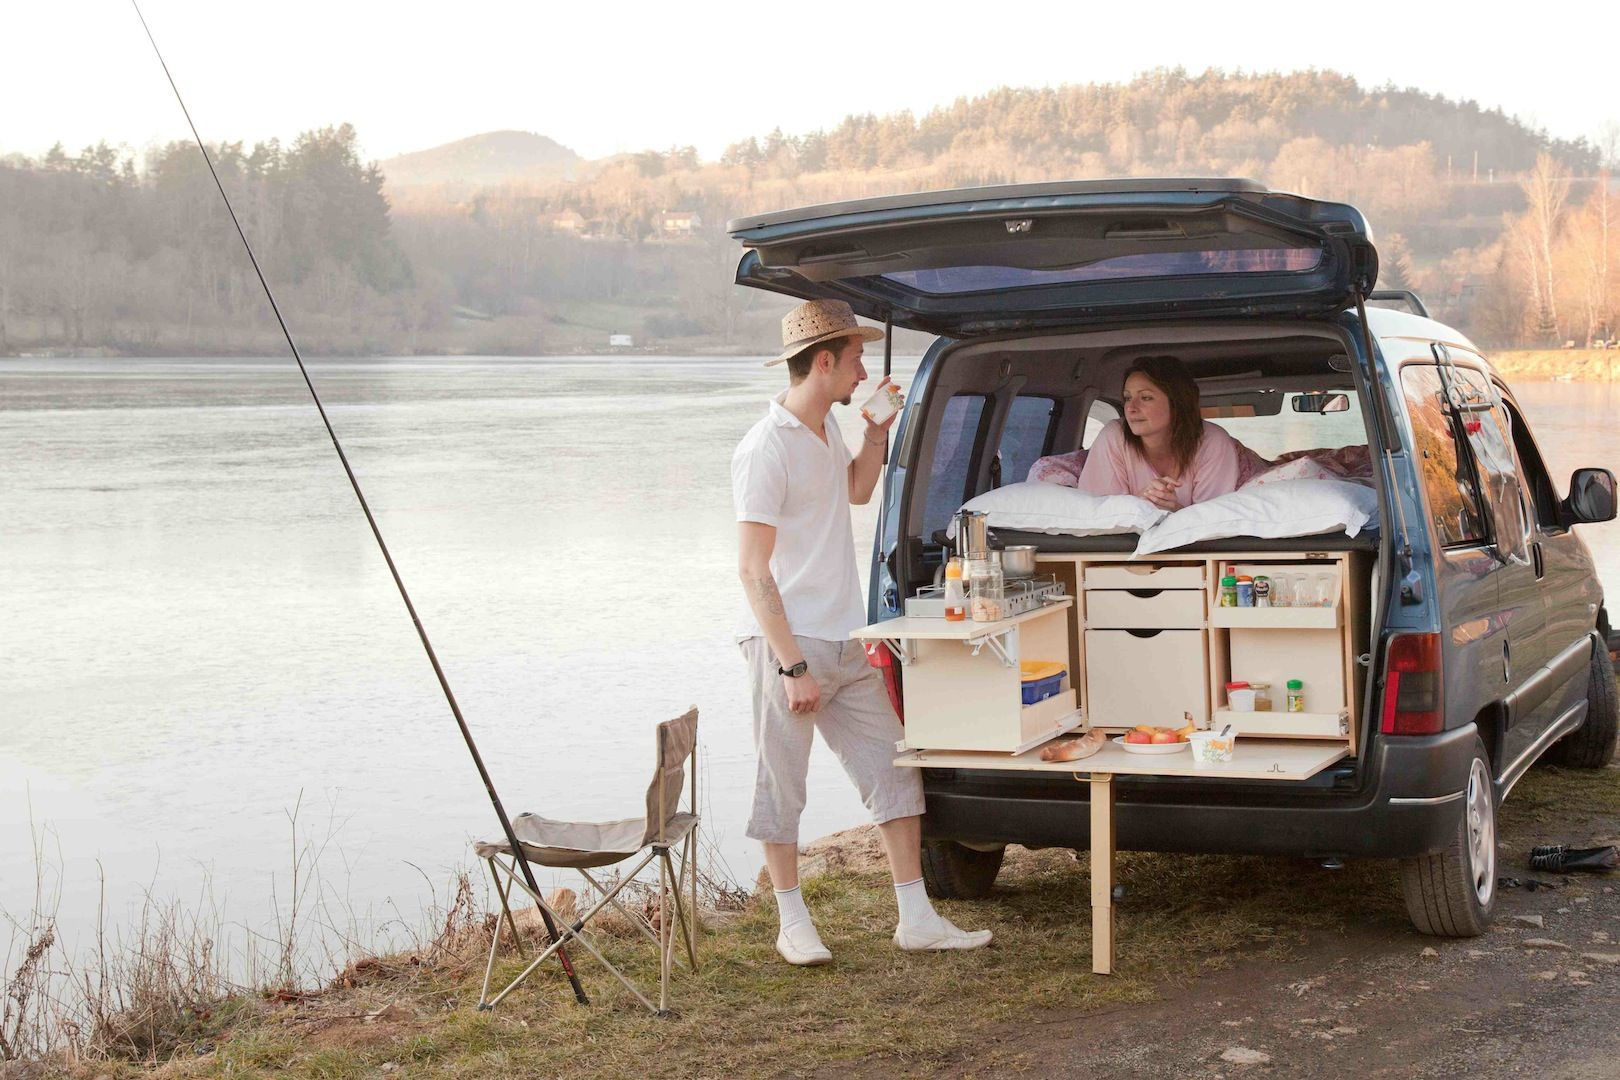 campinambulle vous permet de dormir et manger dans votre voiture campinambulle camping. Black Bedroom Furniture Sets. Home Design Ideas